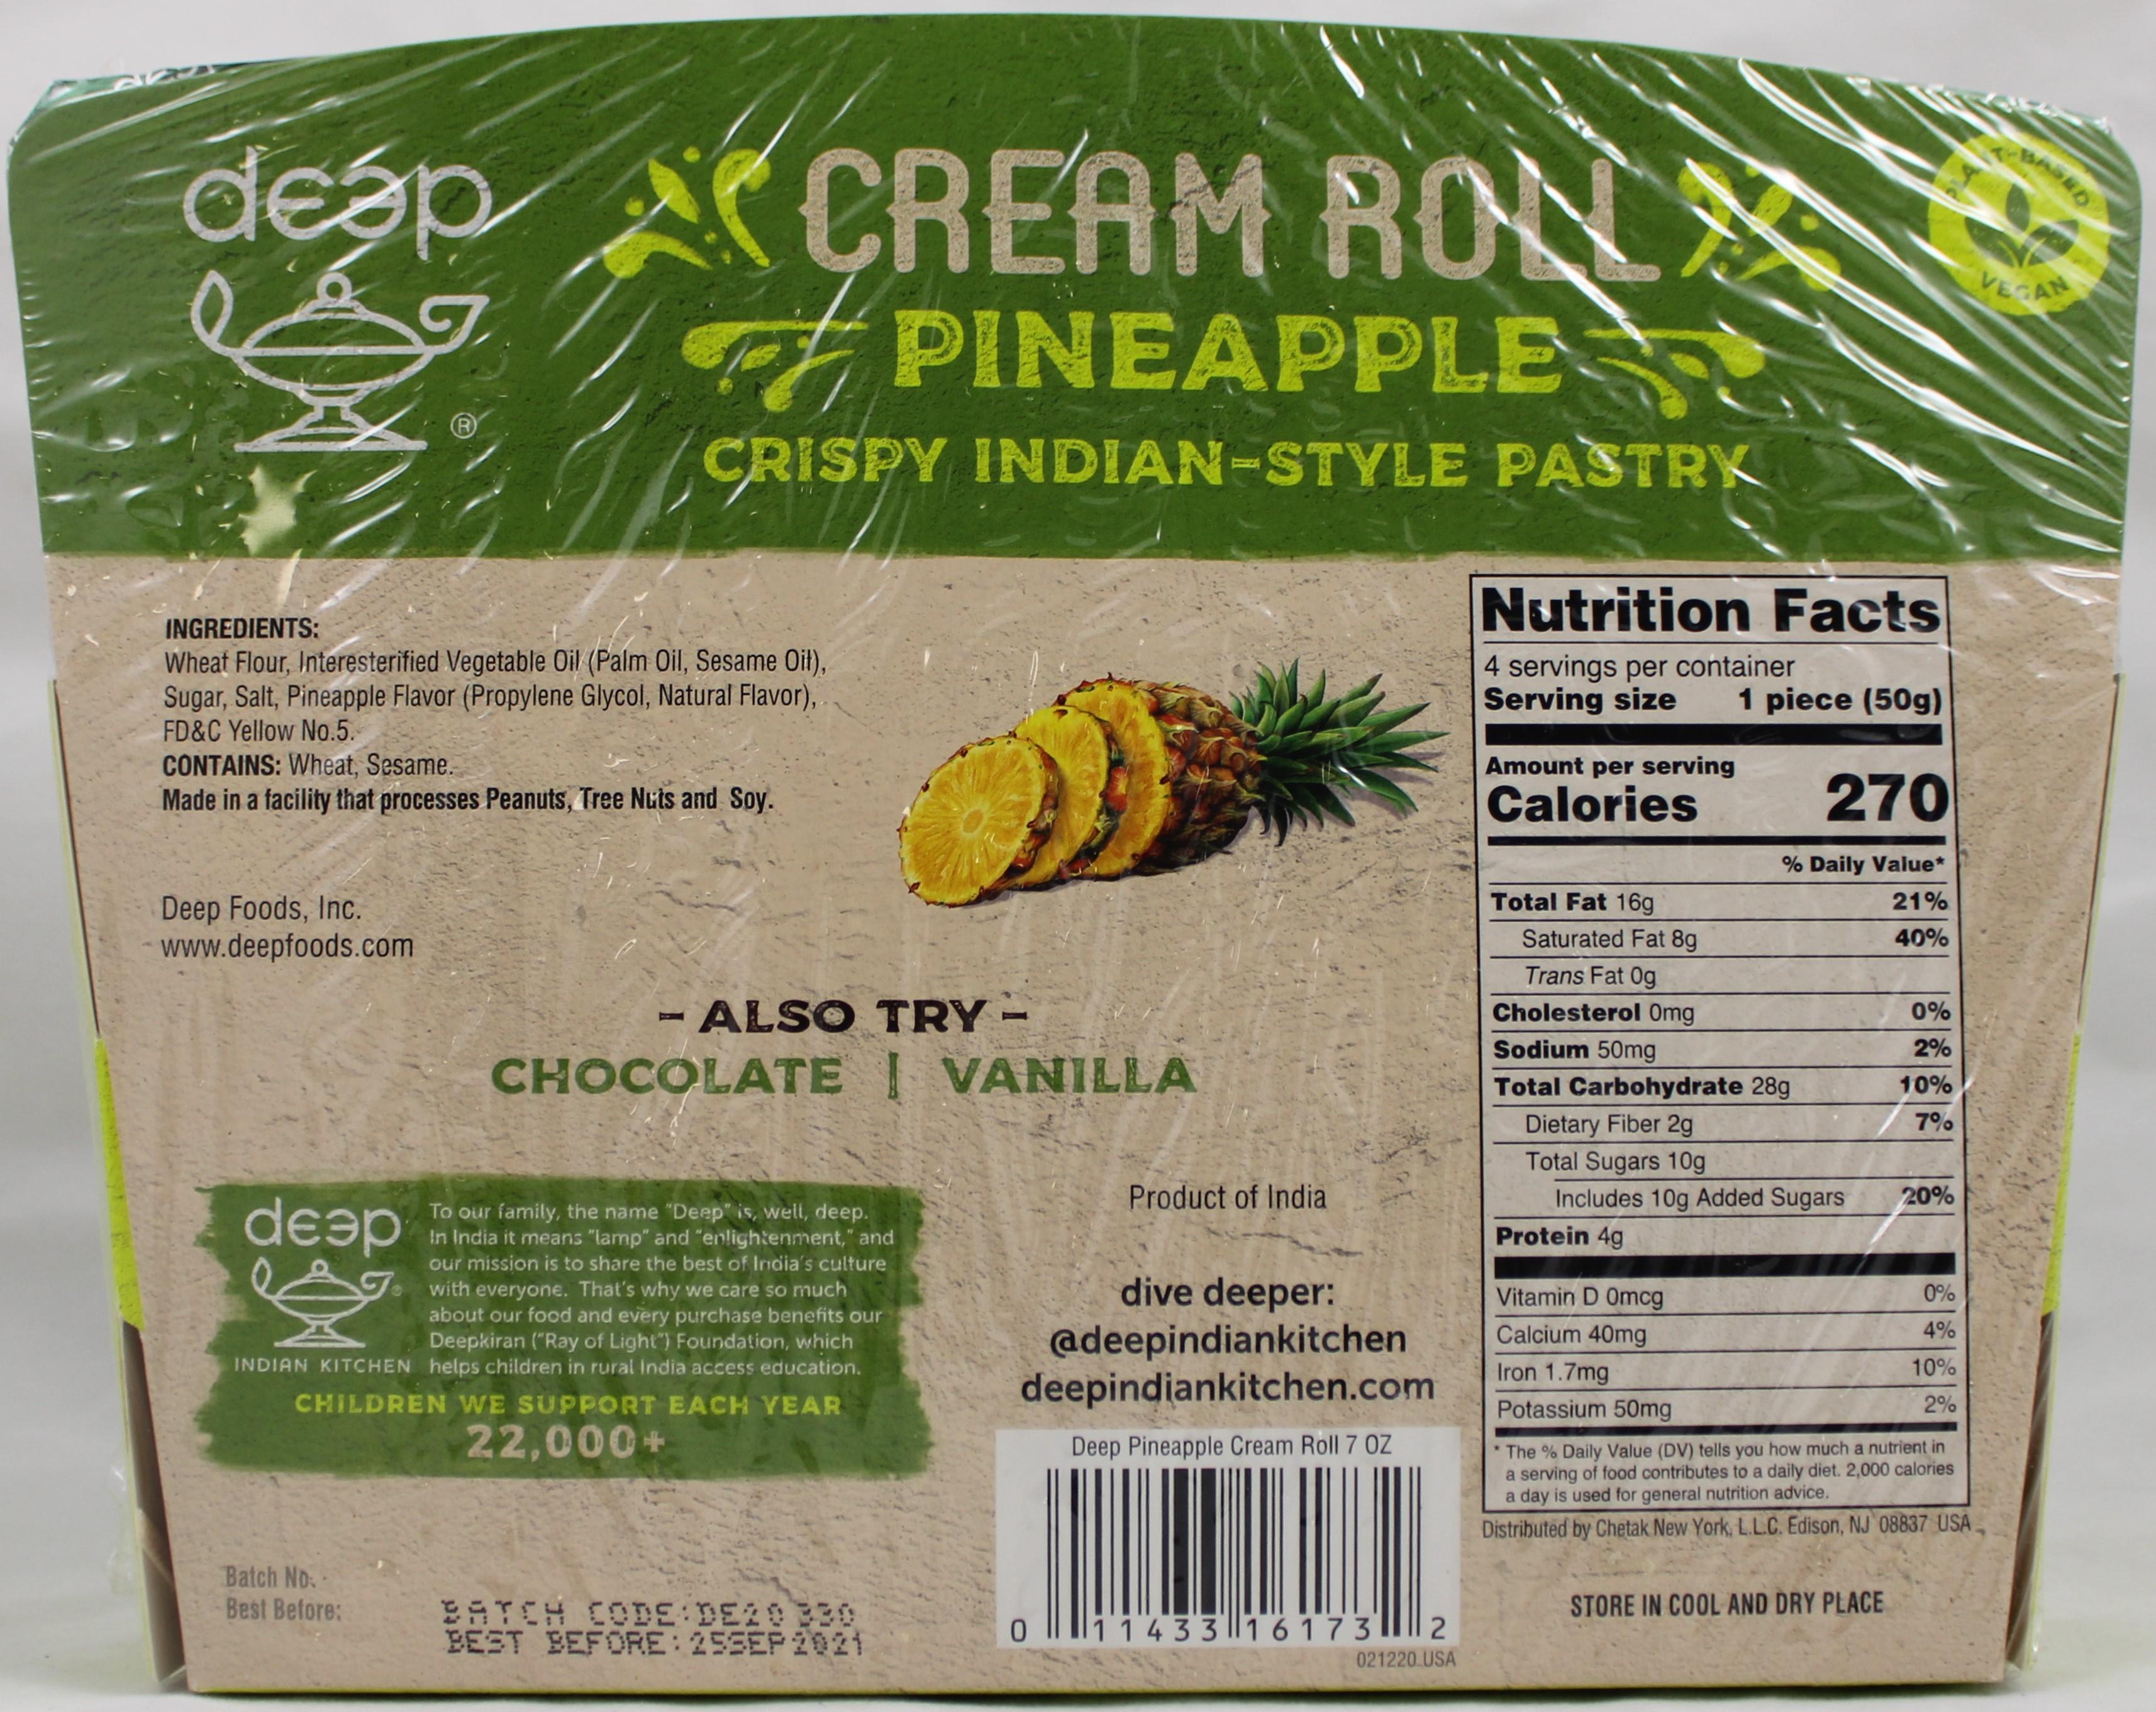 Cream Rolls-Pineapple (4 pcs) 7 Oz